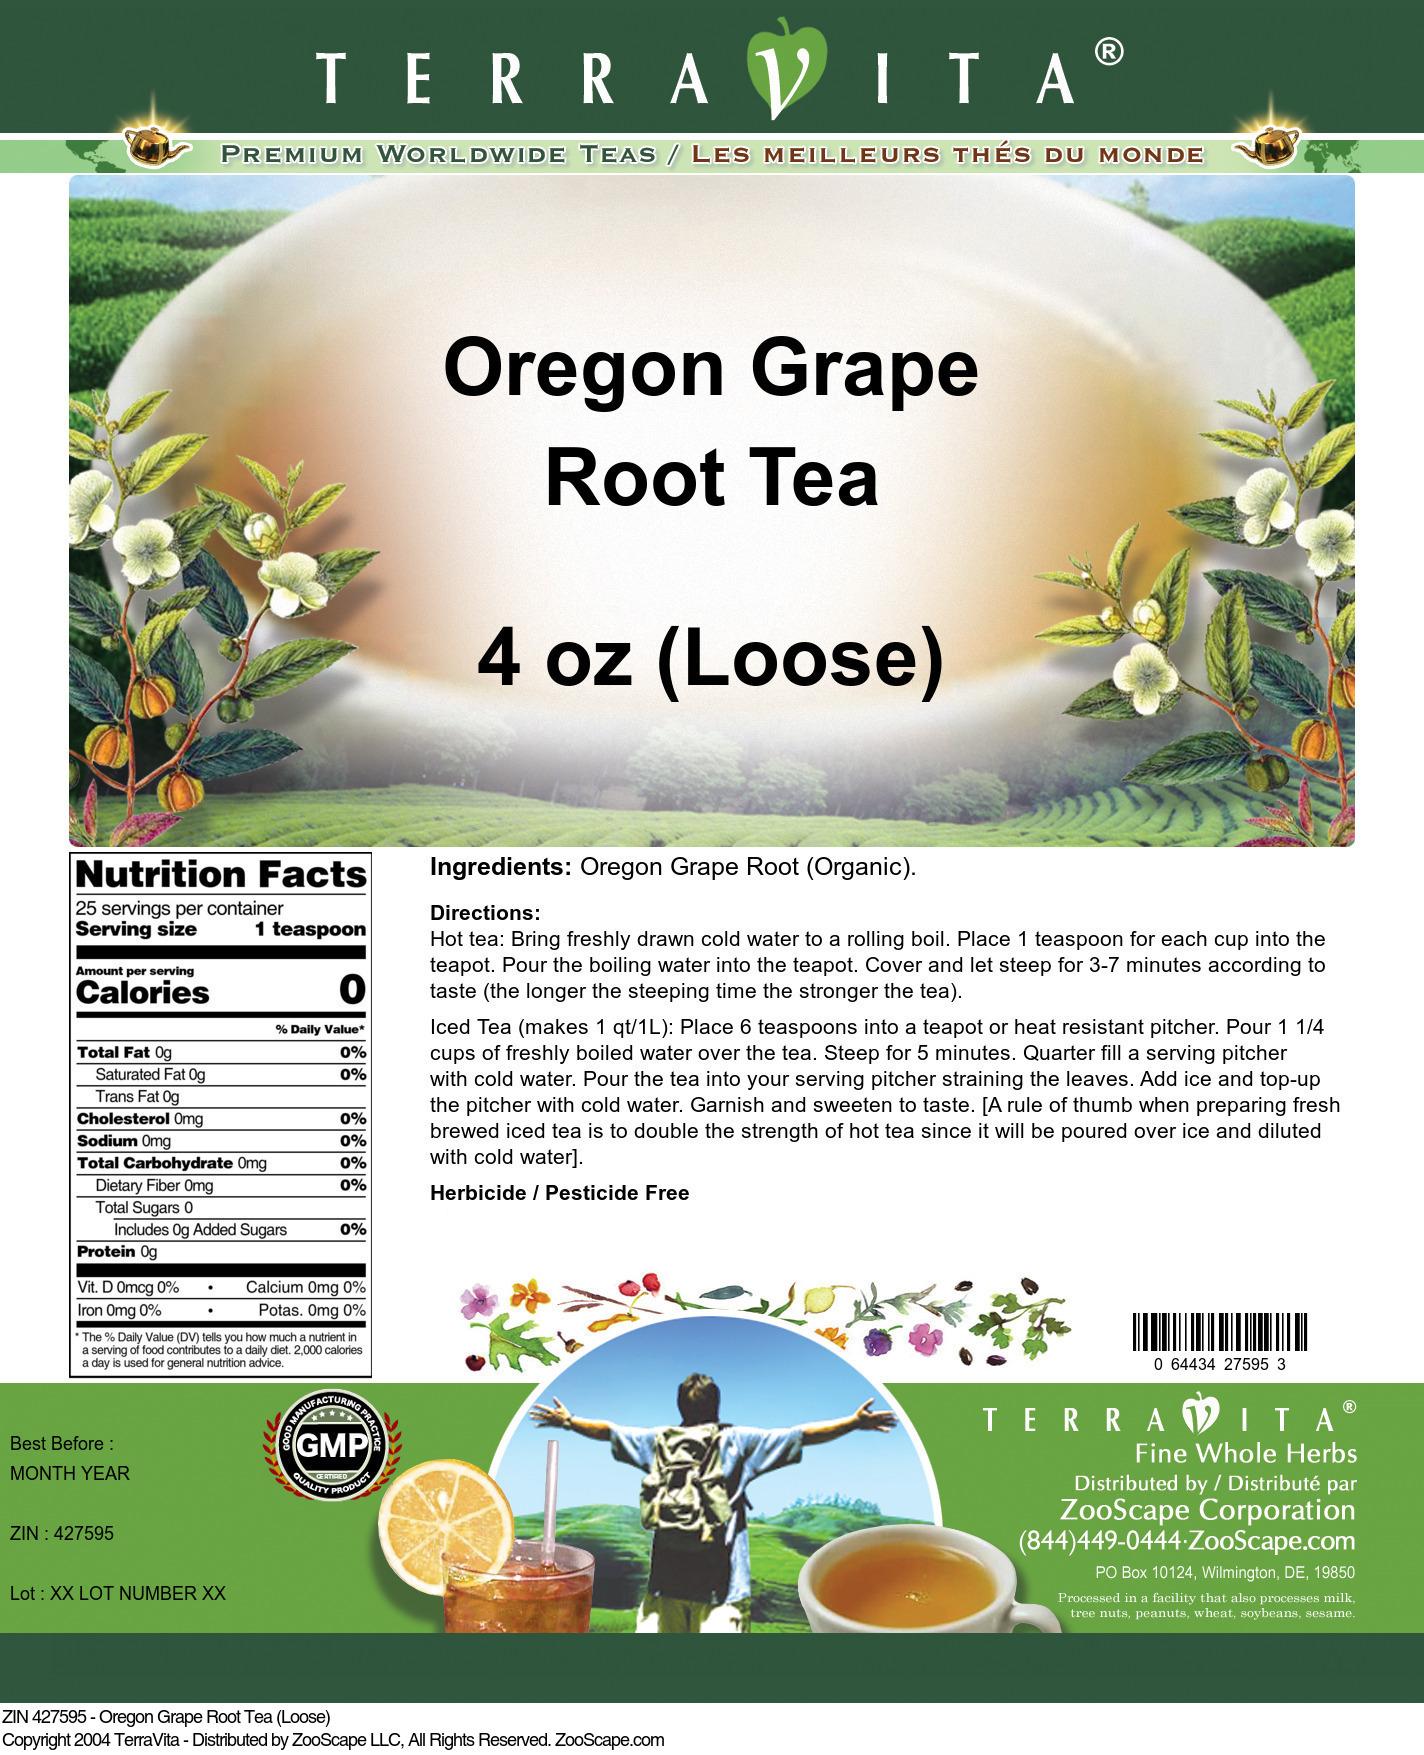 Oregon Grape Root Tea (Loose)